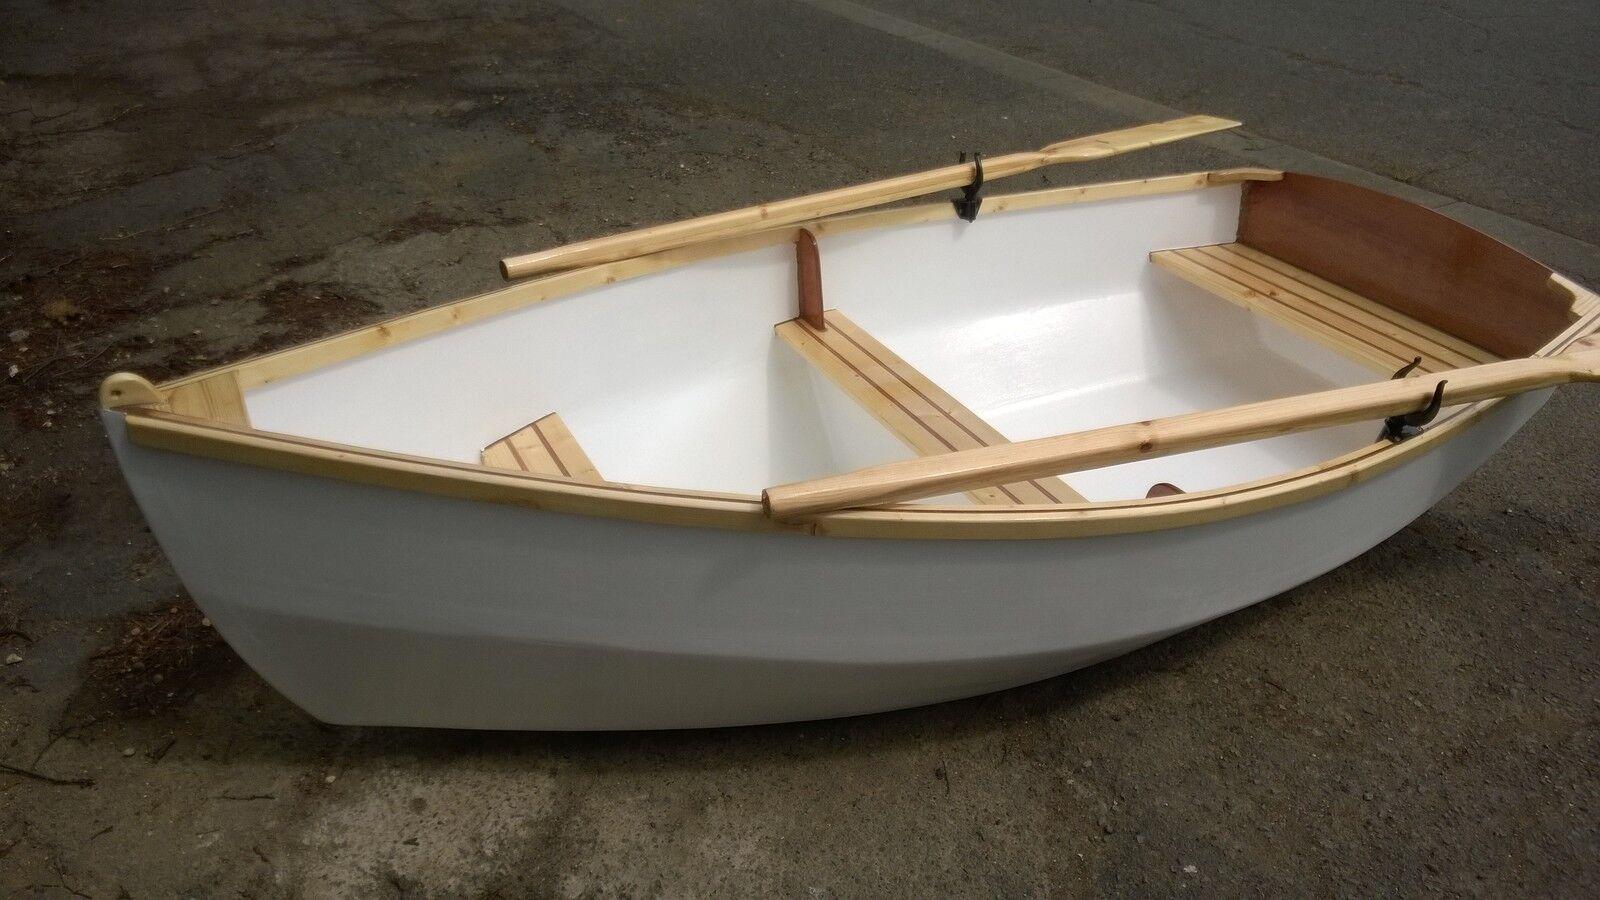 DIY Plans for RYE BAY 228 Rowing Motor Sailing Dinghy - full printed plans